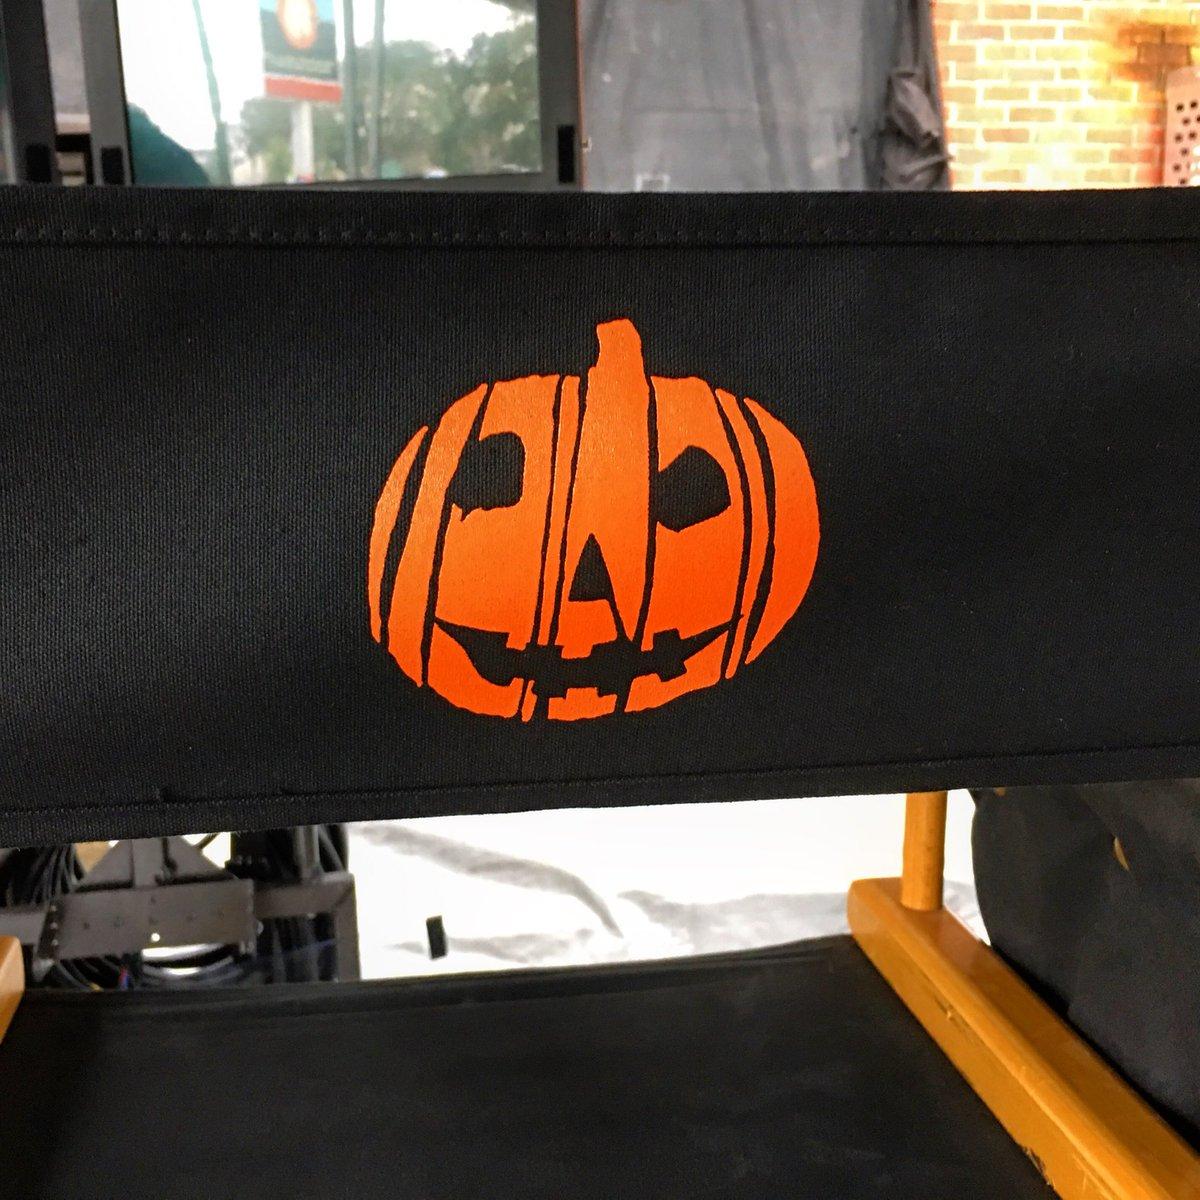 🎃🔪 #HalloweenMovie @halloweenmovie https://t.co/pXOu4JjiYy